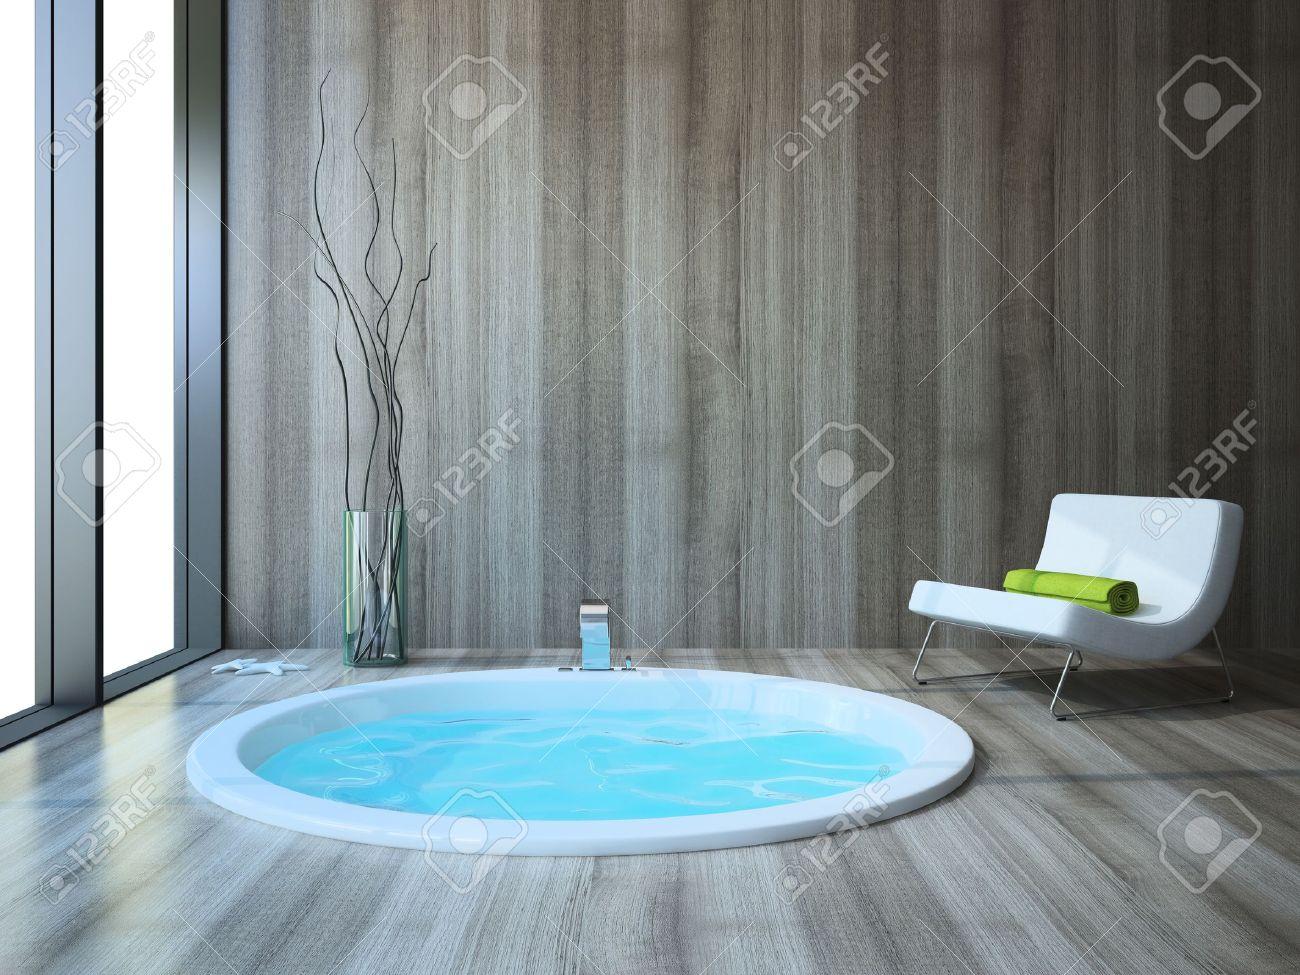 Bathroom in modern style Stock Photo - 19451732